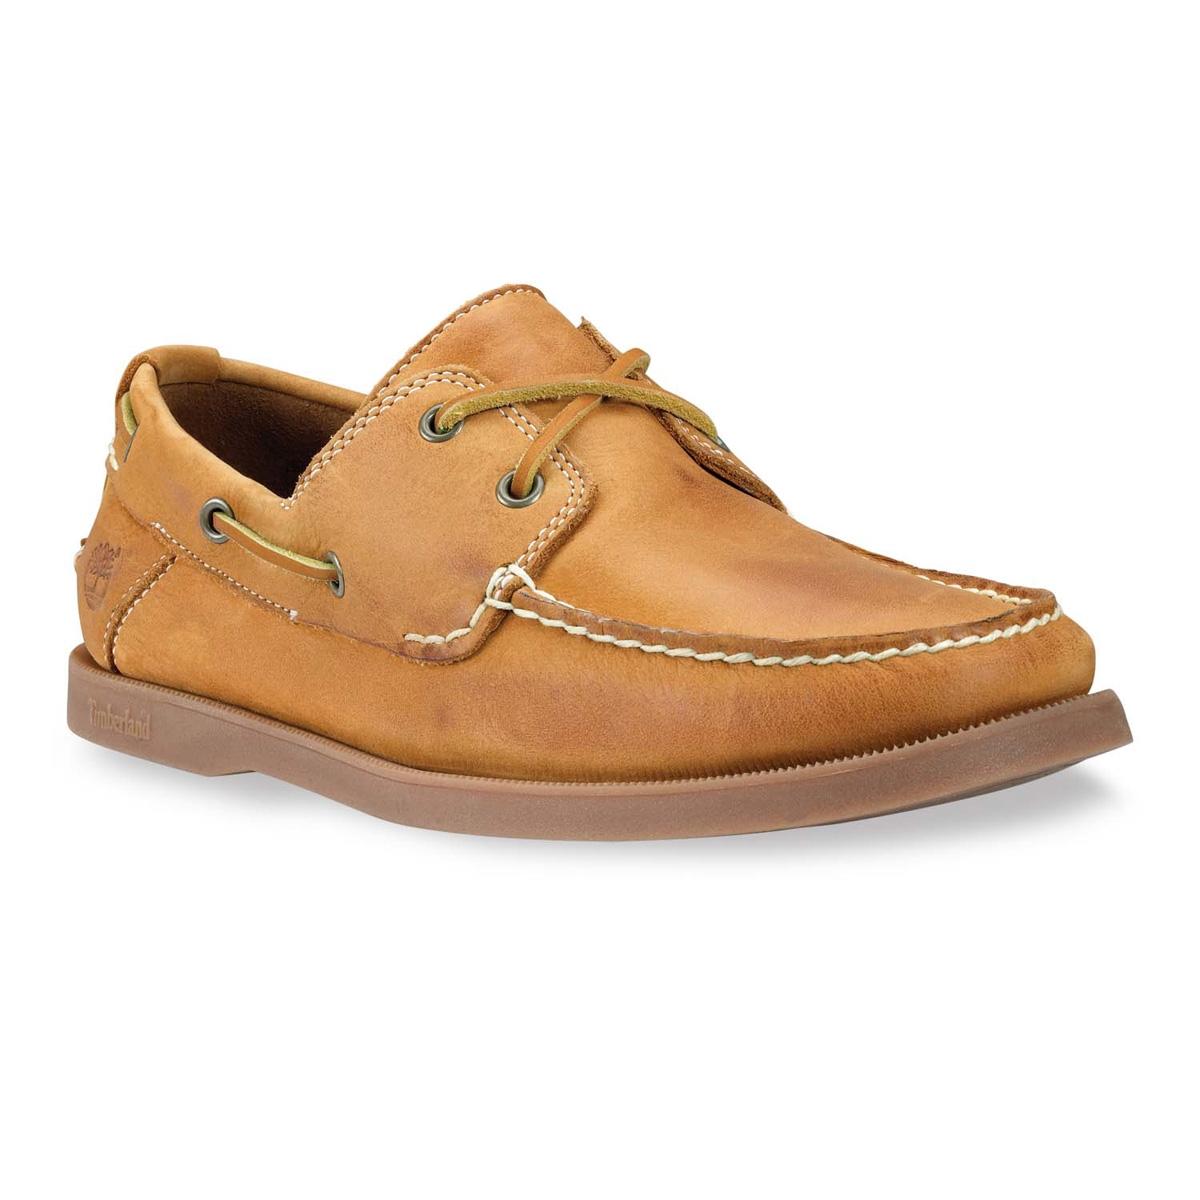 Image of Timberland Earthkeepers Heritage Boat 2-Eye Boat Shoe (Men s) -  Wheat 8f16b9559